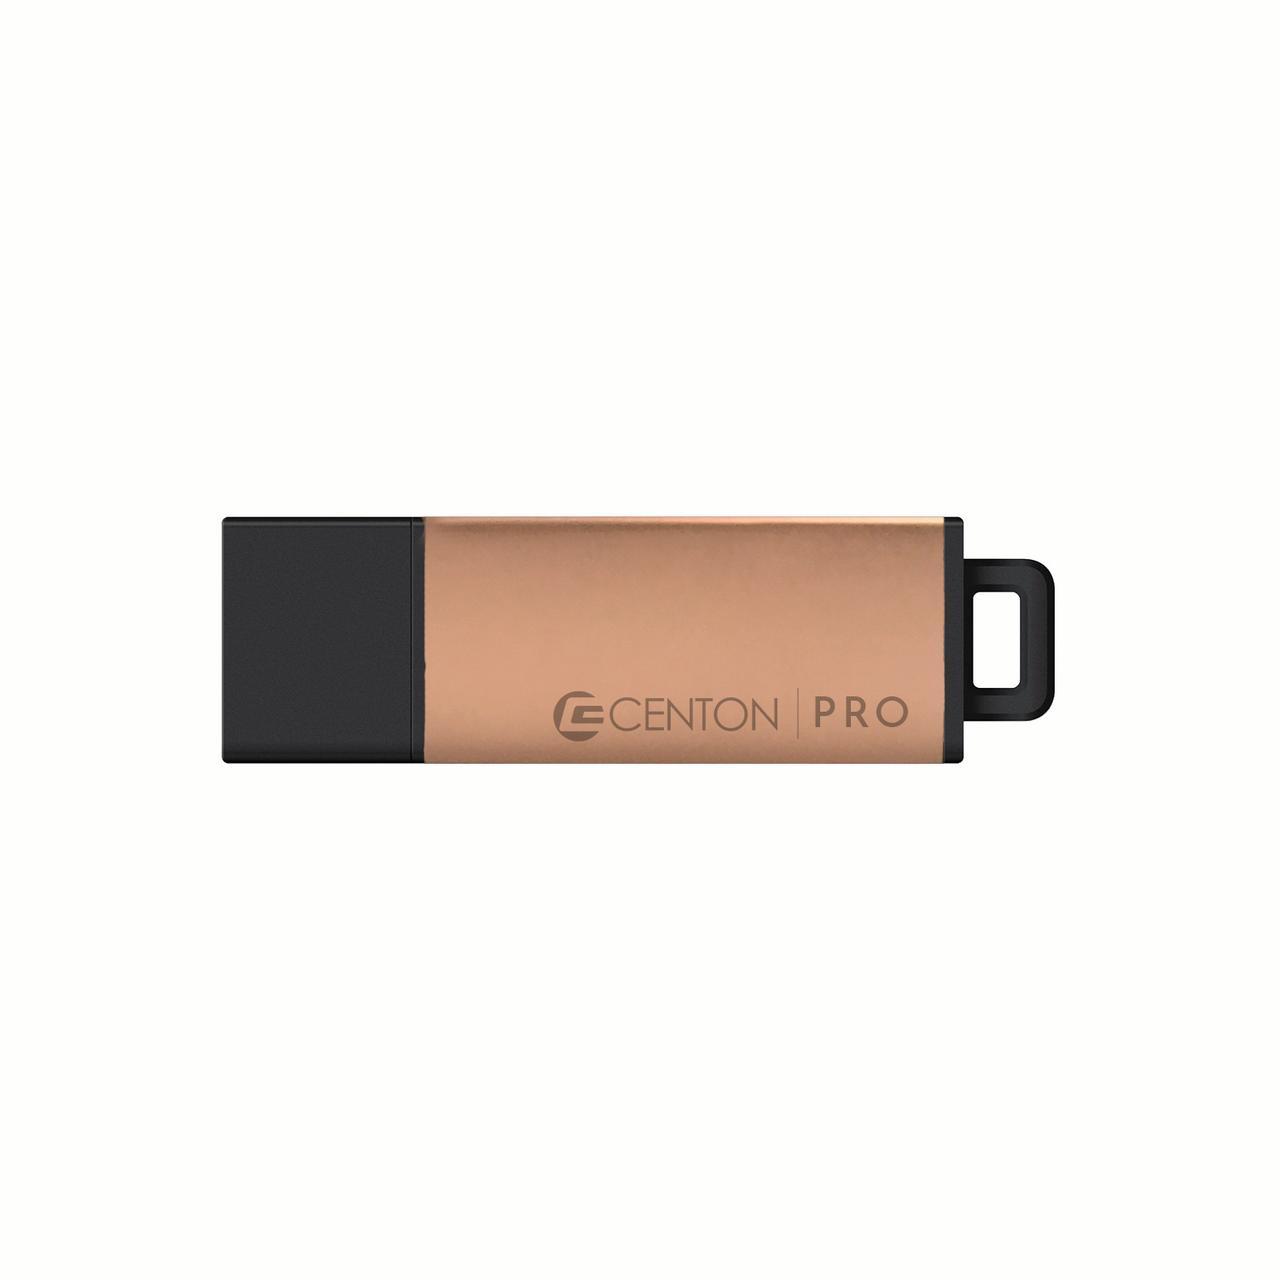 Centon USB 3.0 Datastick Pro (Rose Gold Metallic), 128GB